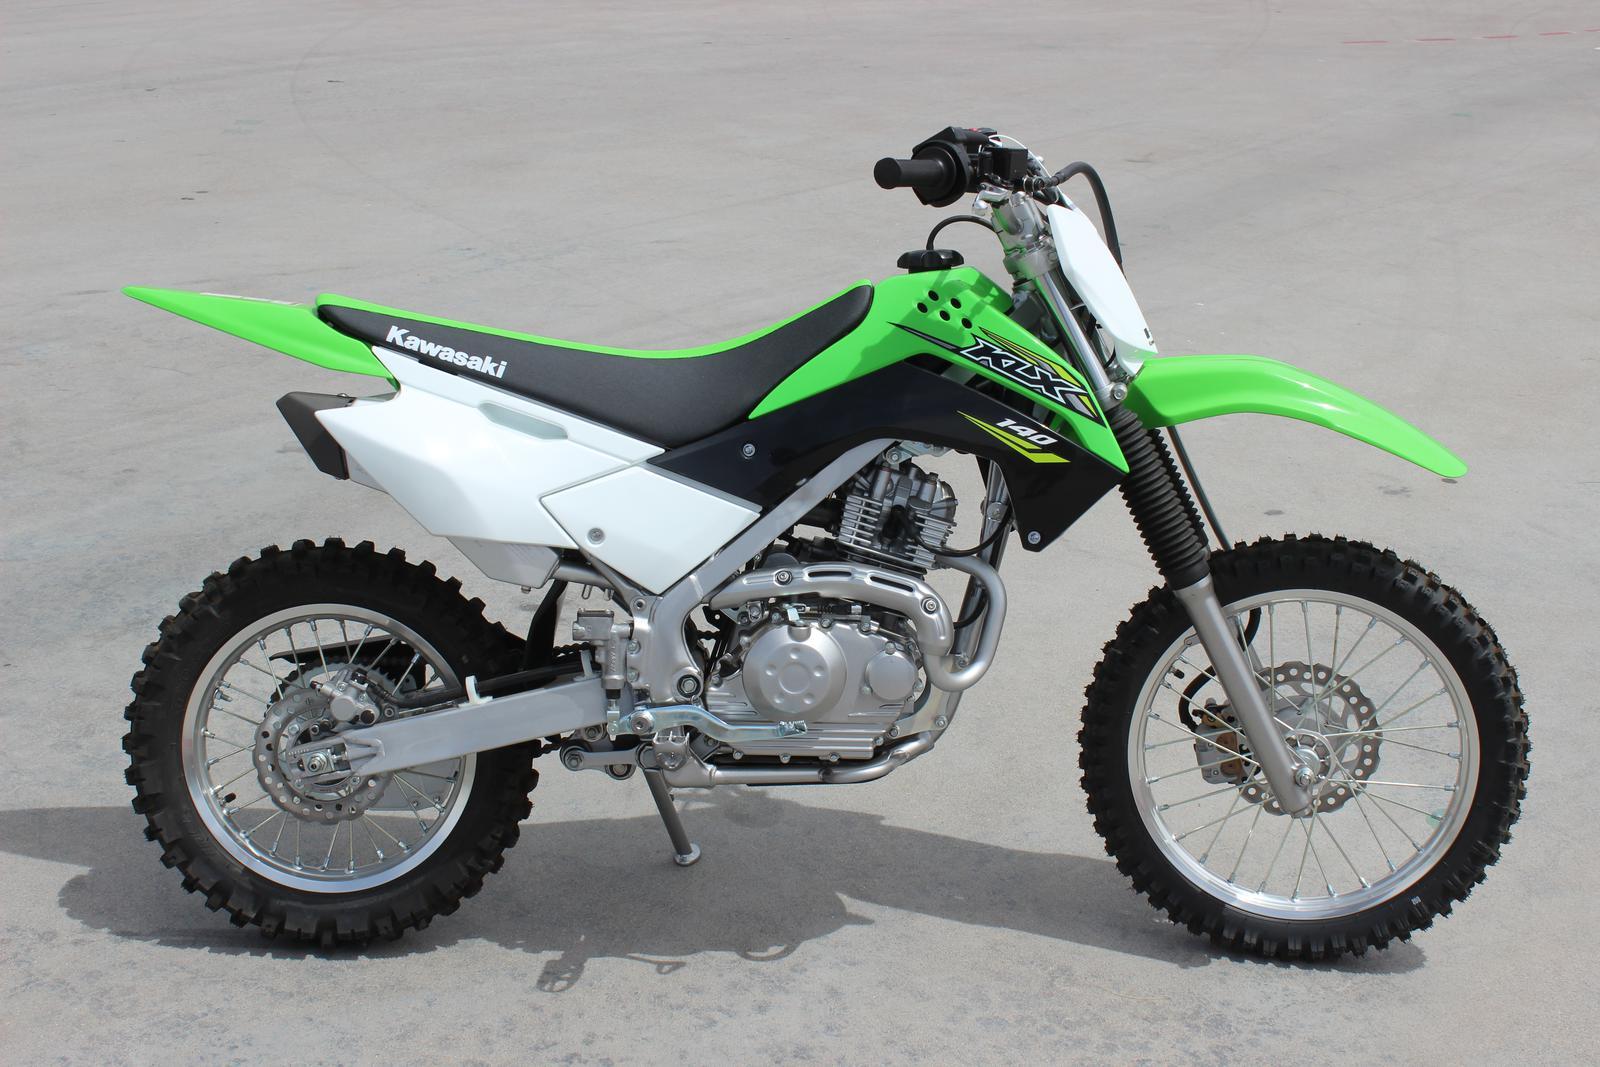 2018 Kawasaki KLX140 for sale in Scottsdale, AZ. GO AZ Motorcycles